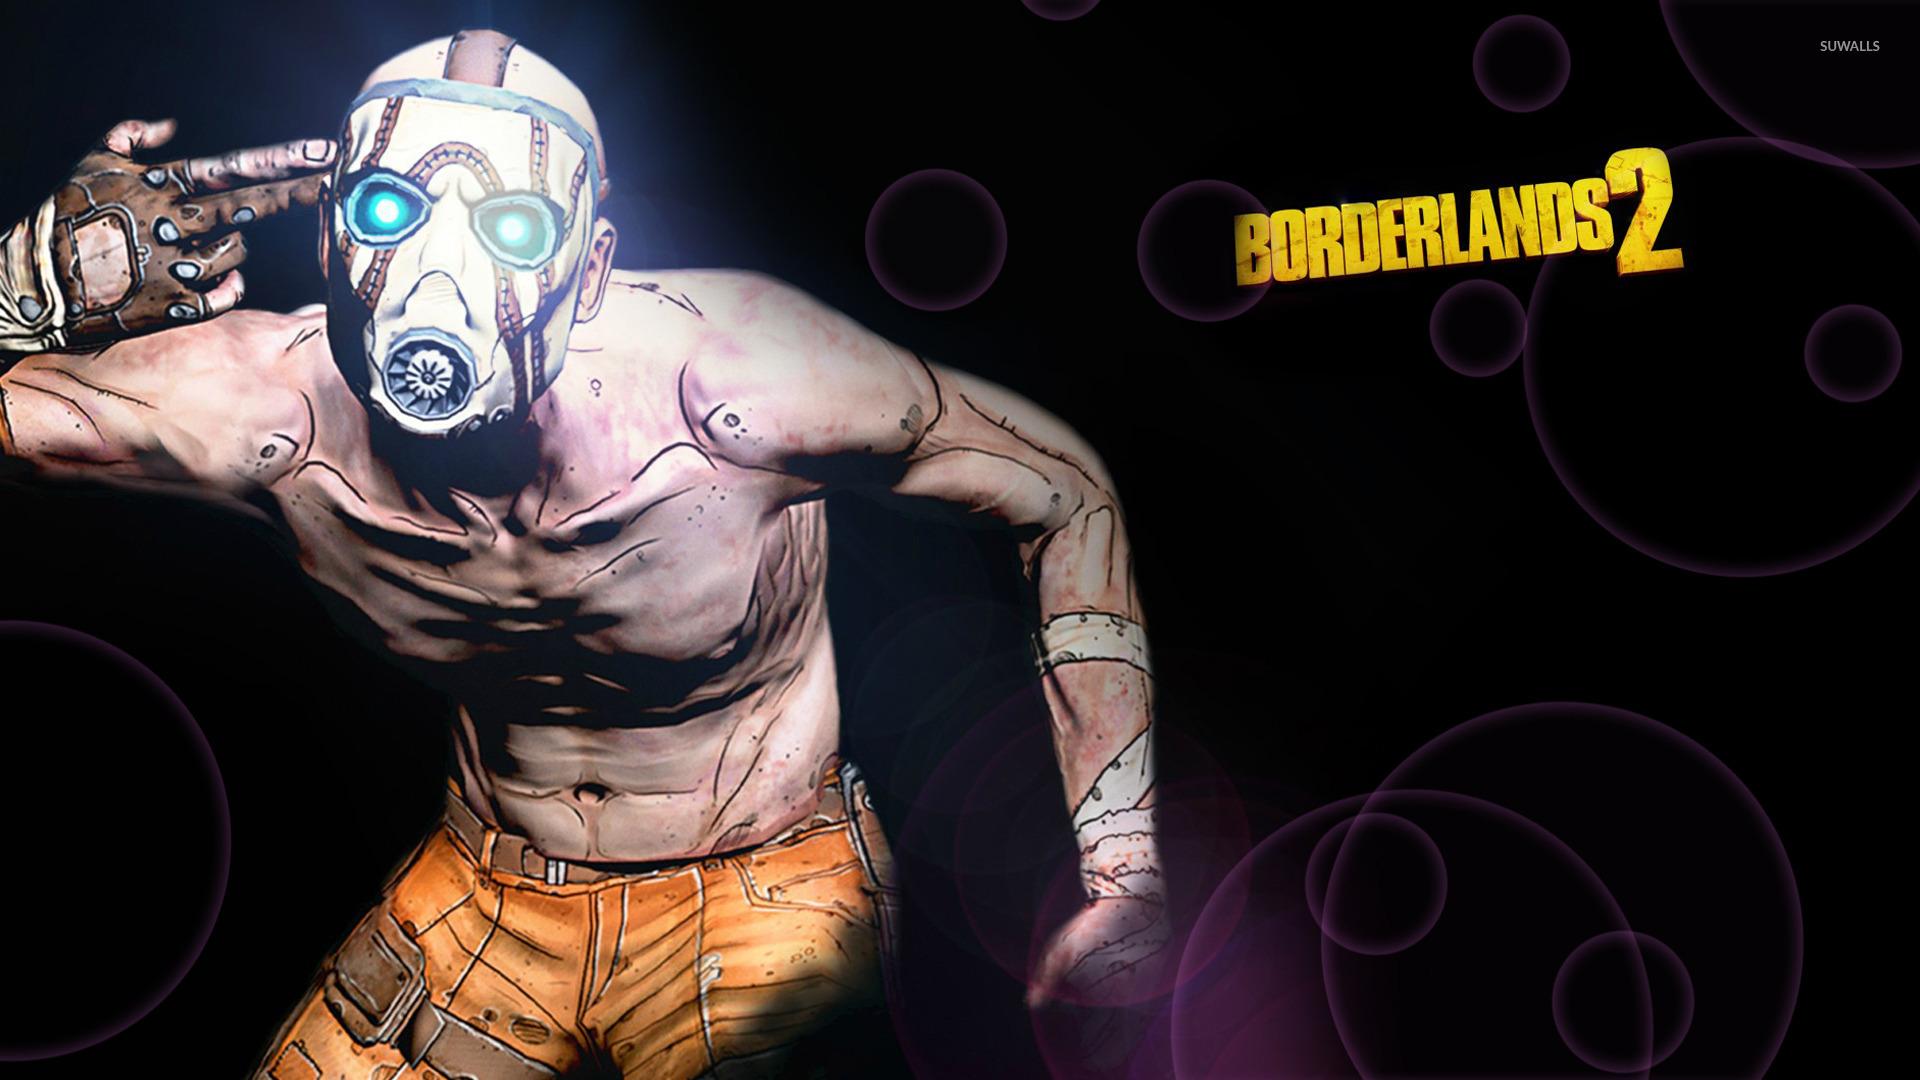 Borderlands 2 5 wallpaper game wallpapers 22706 borderlands 2 5 wallpaper voltagebd Image collections